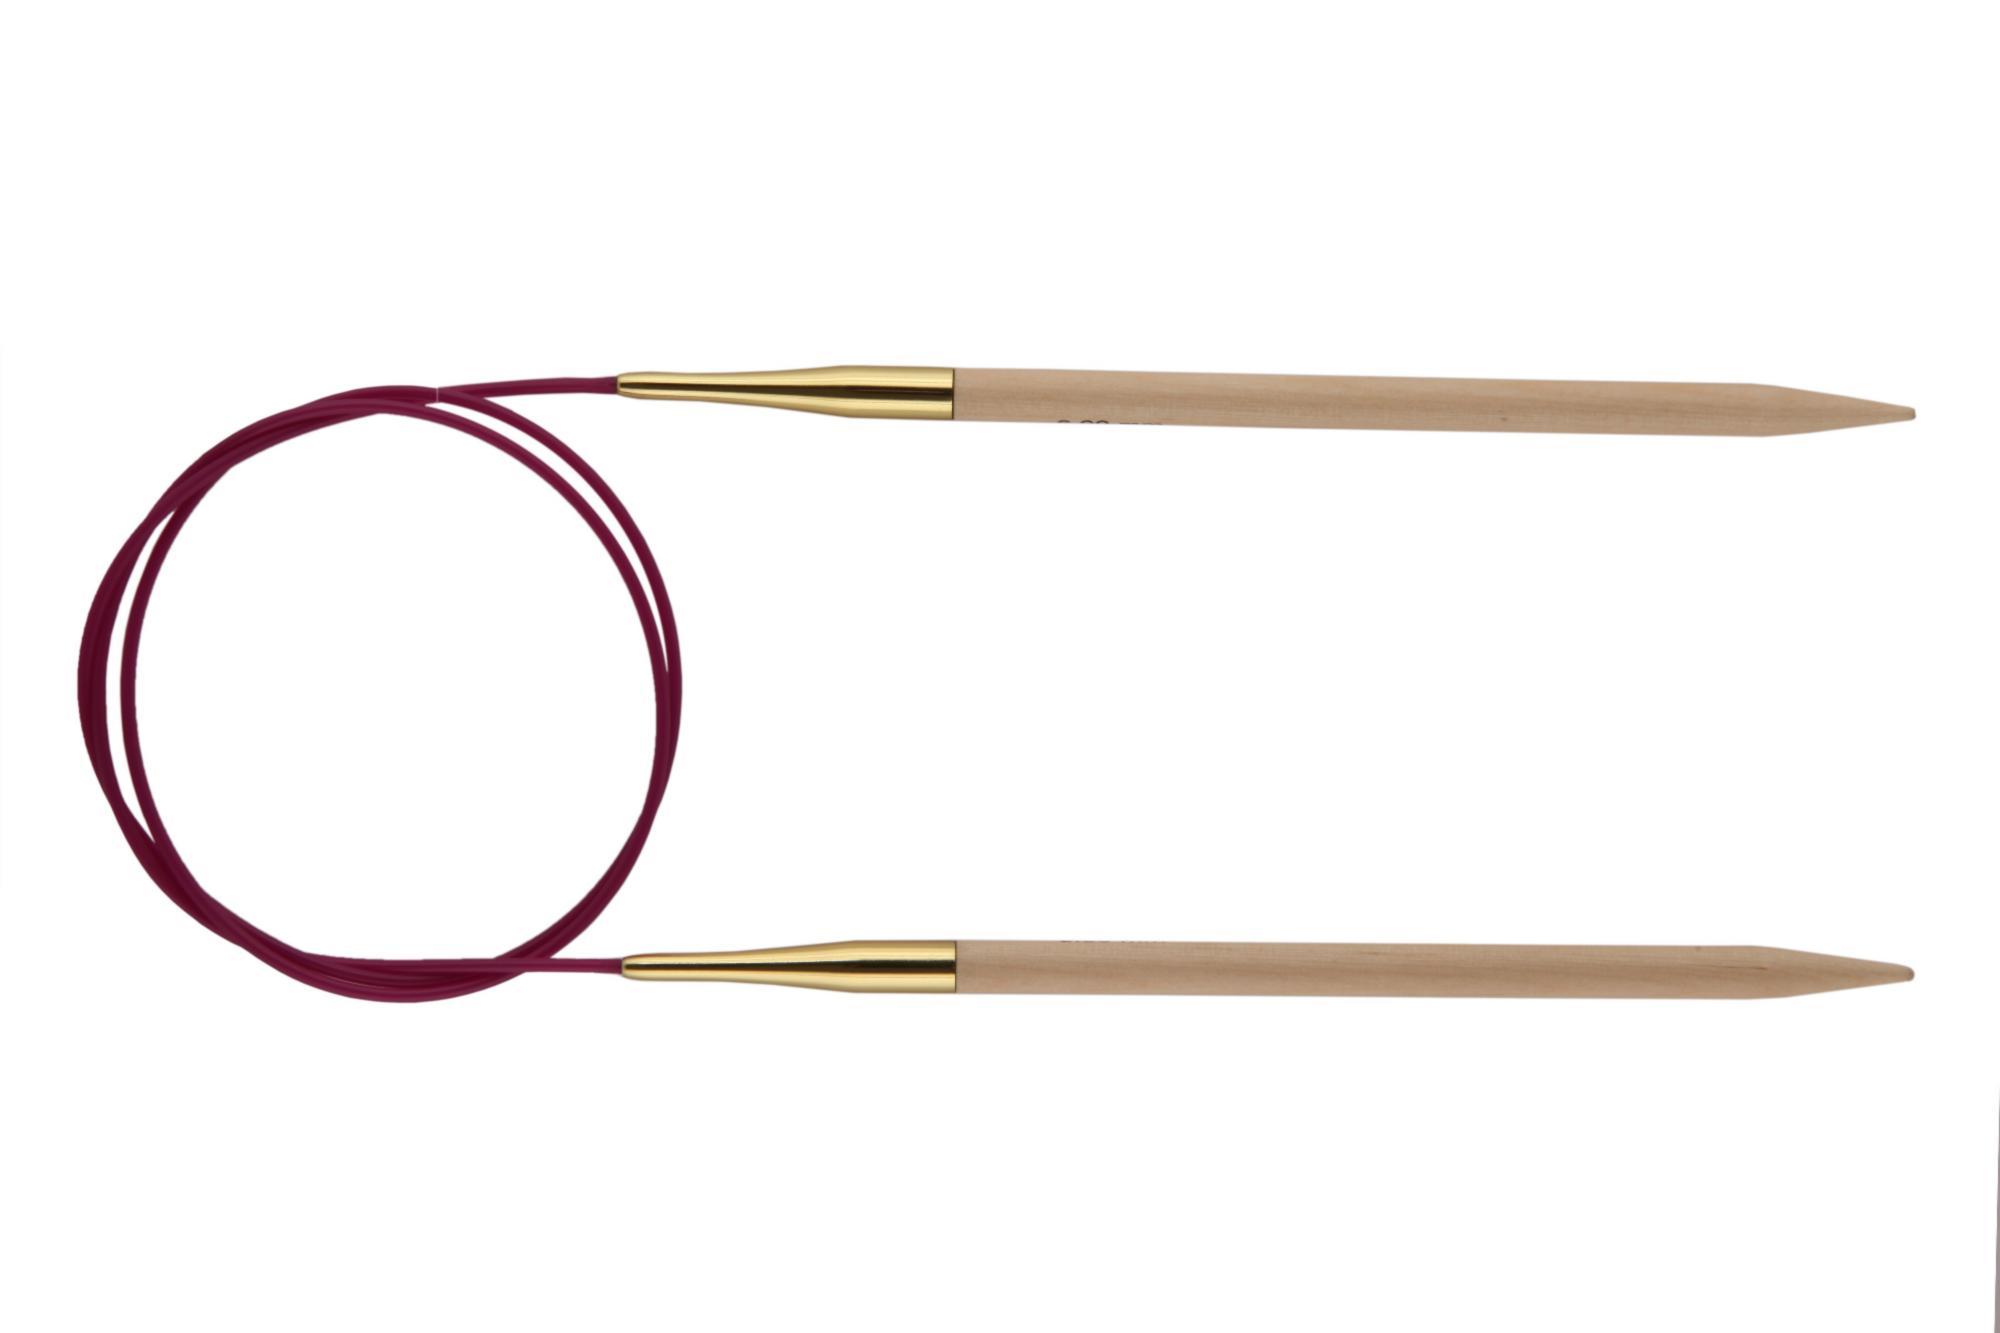 Спицы круговые 80 см Basix Birch Wood KnitPro, 35332, 6.00 мм